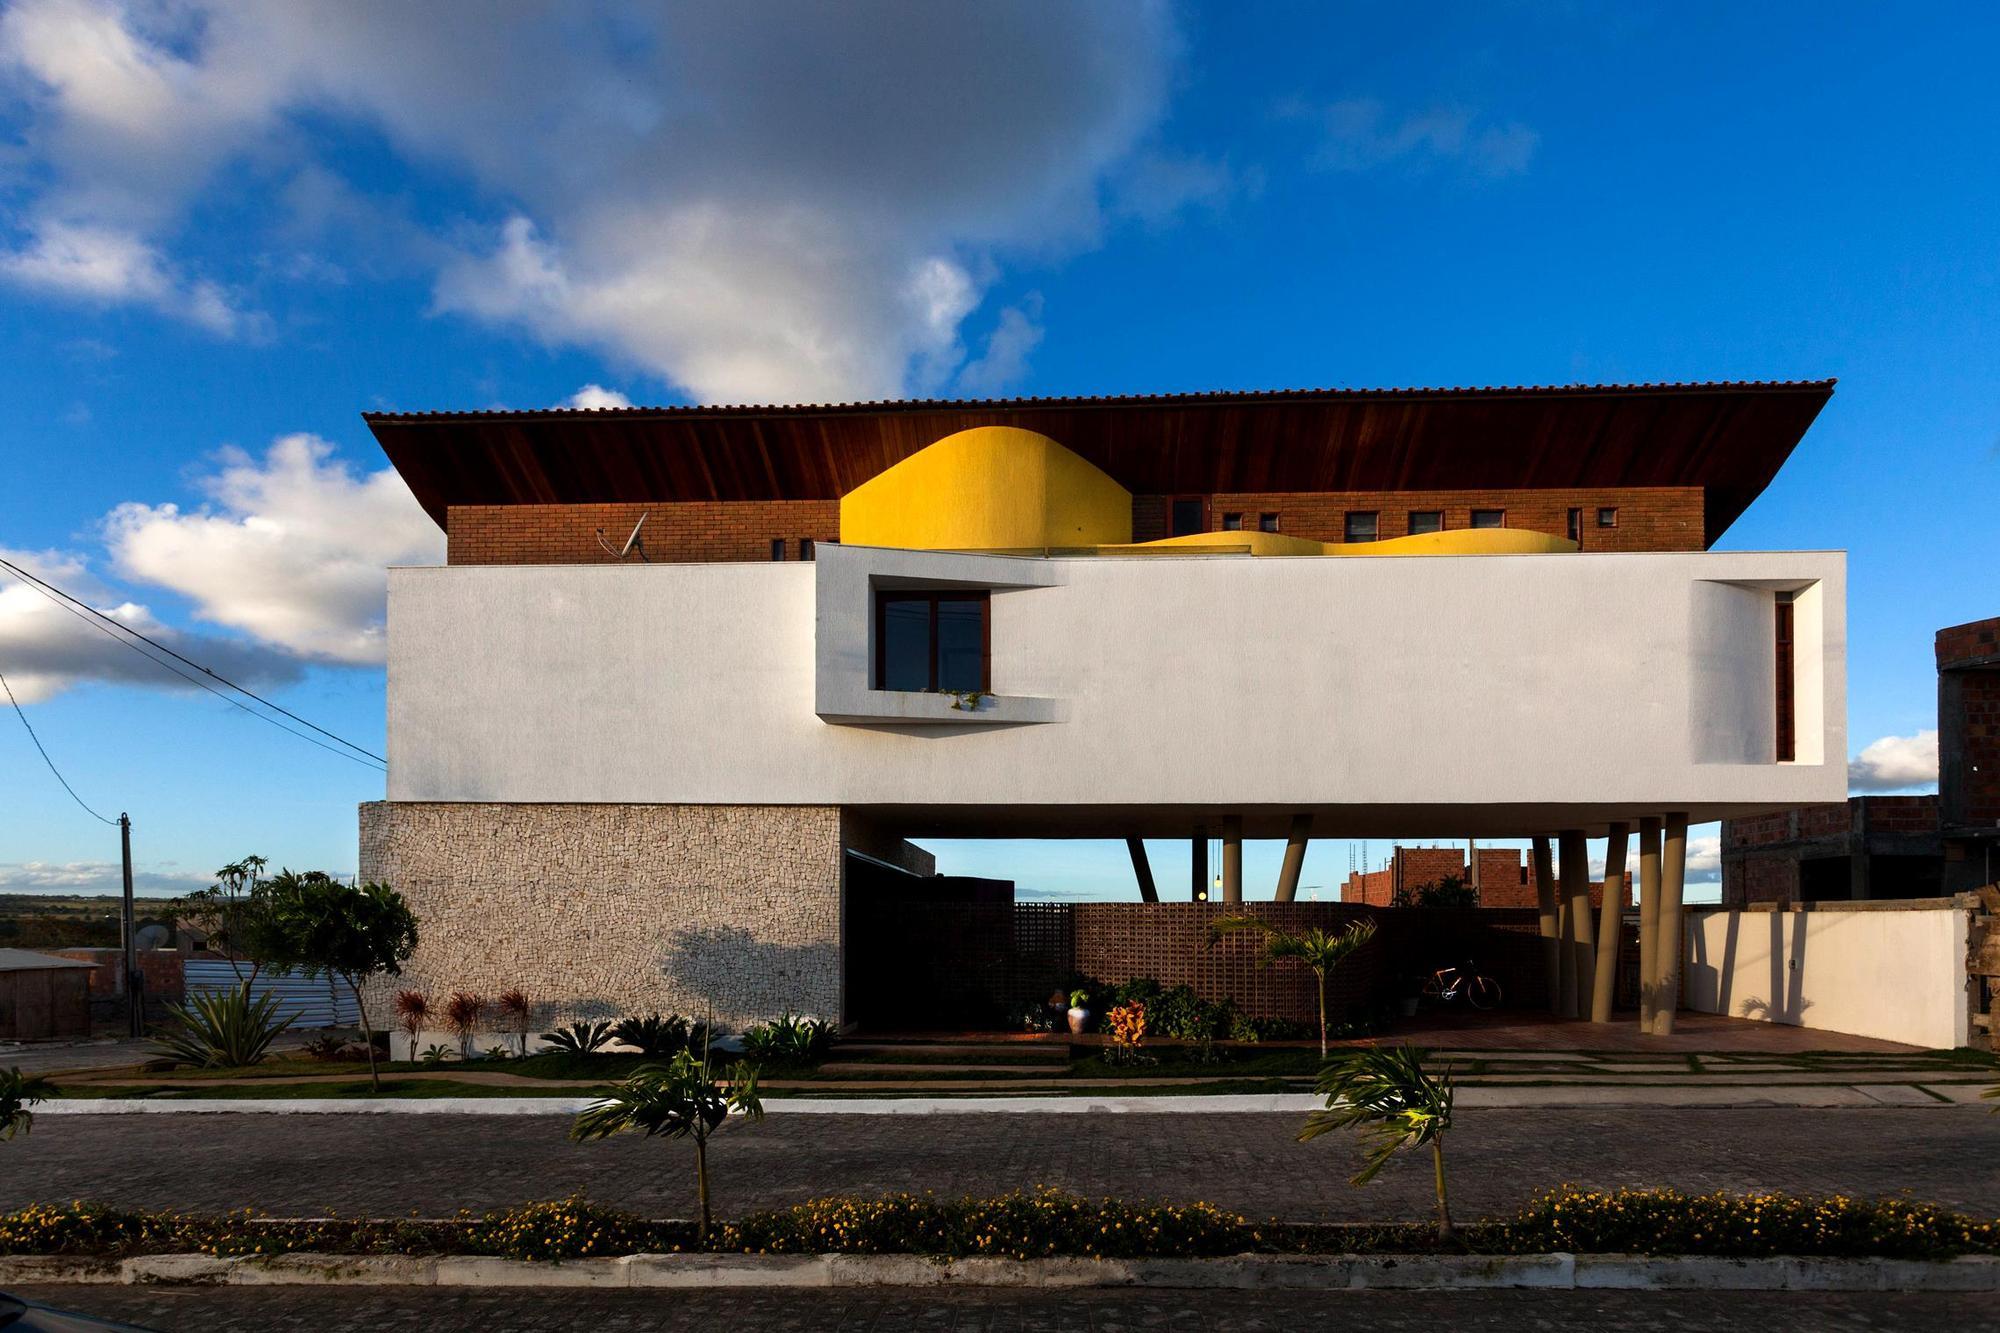 54484721e58ecebb8100018d_architect-s-house-jirau-arquitetura__mg_9066